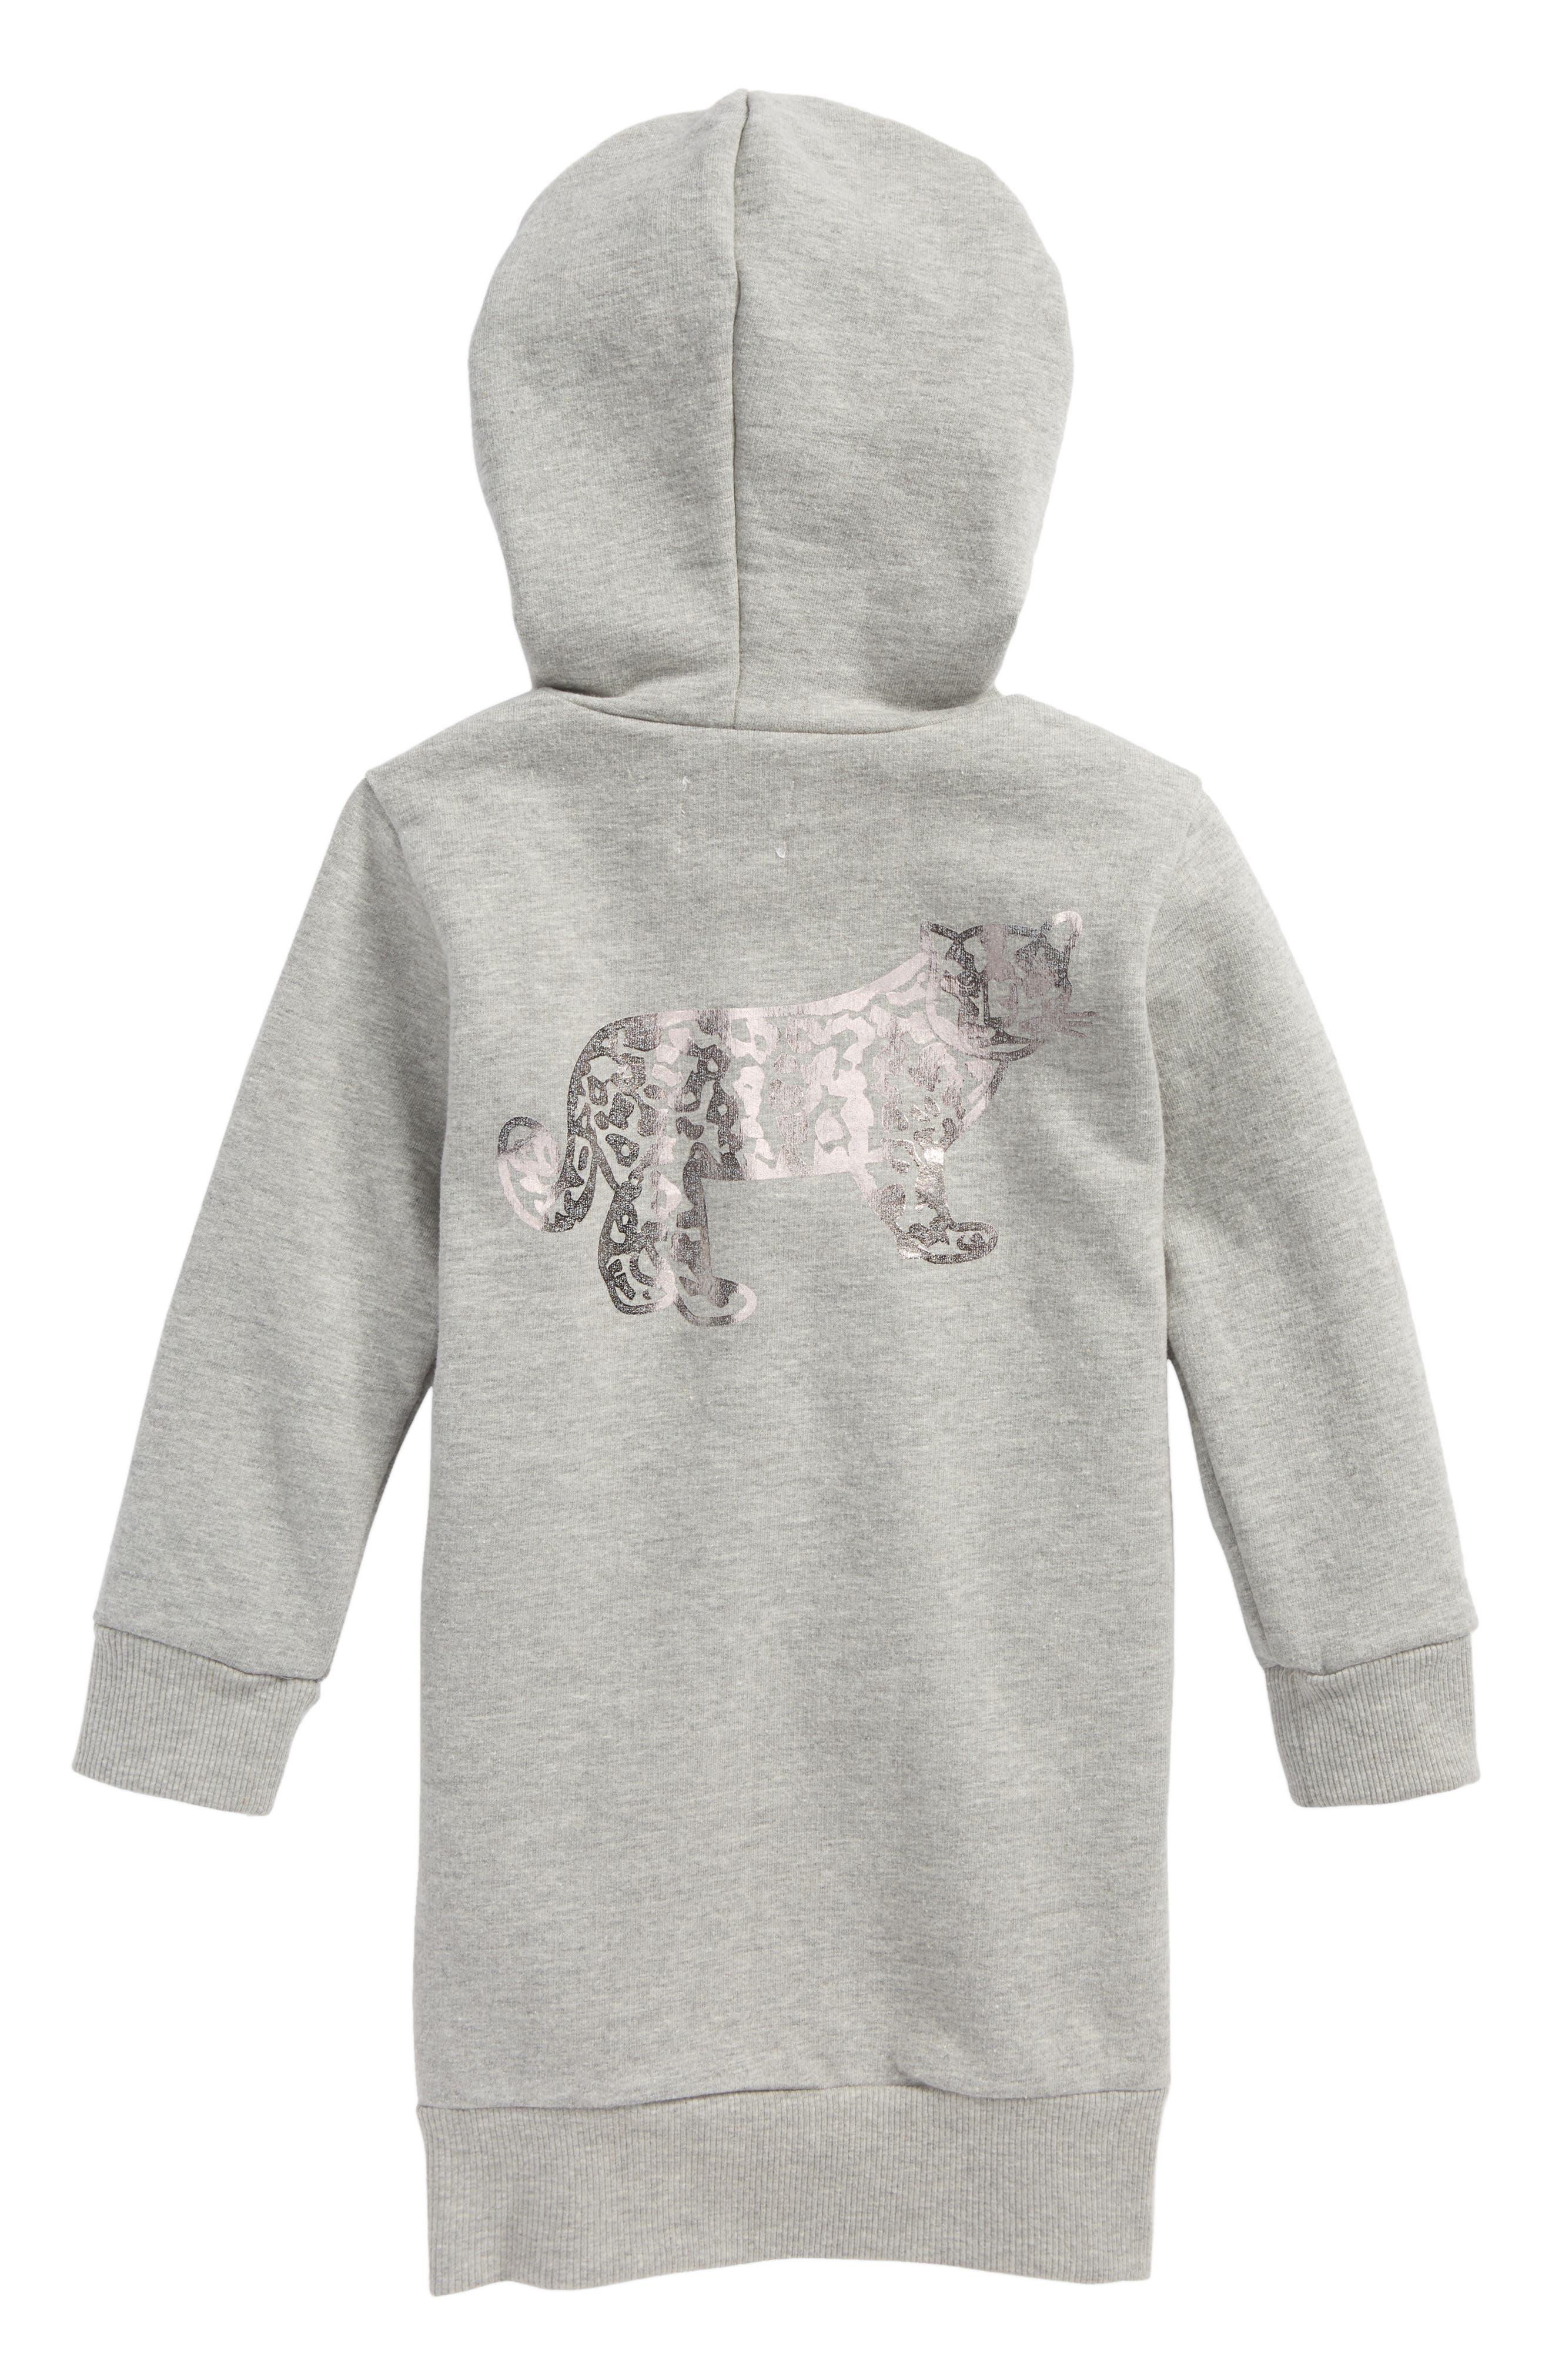 Alternate Image 2  - Beru Luna Hooded Sweatshirt Dress (Toddler Girls & Little Girls)